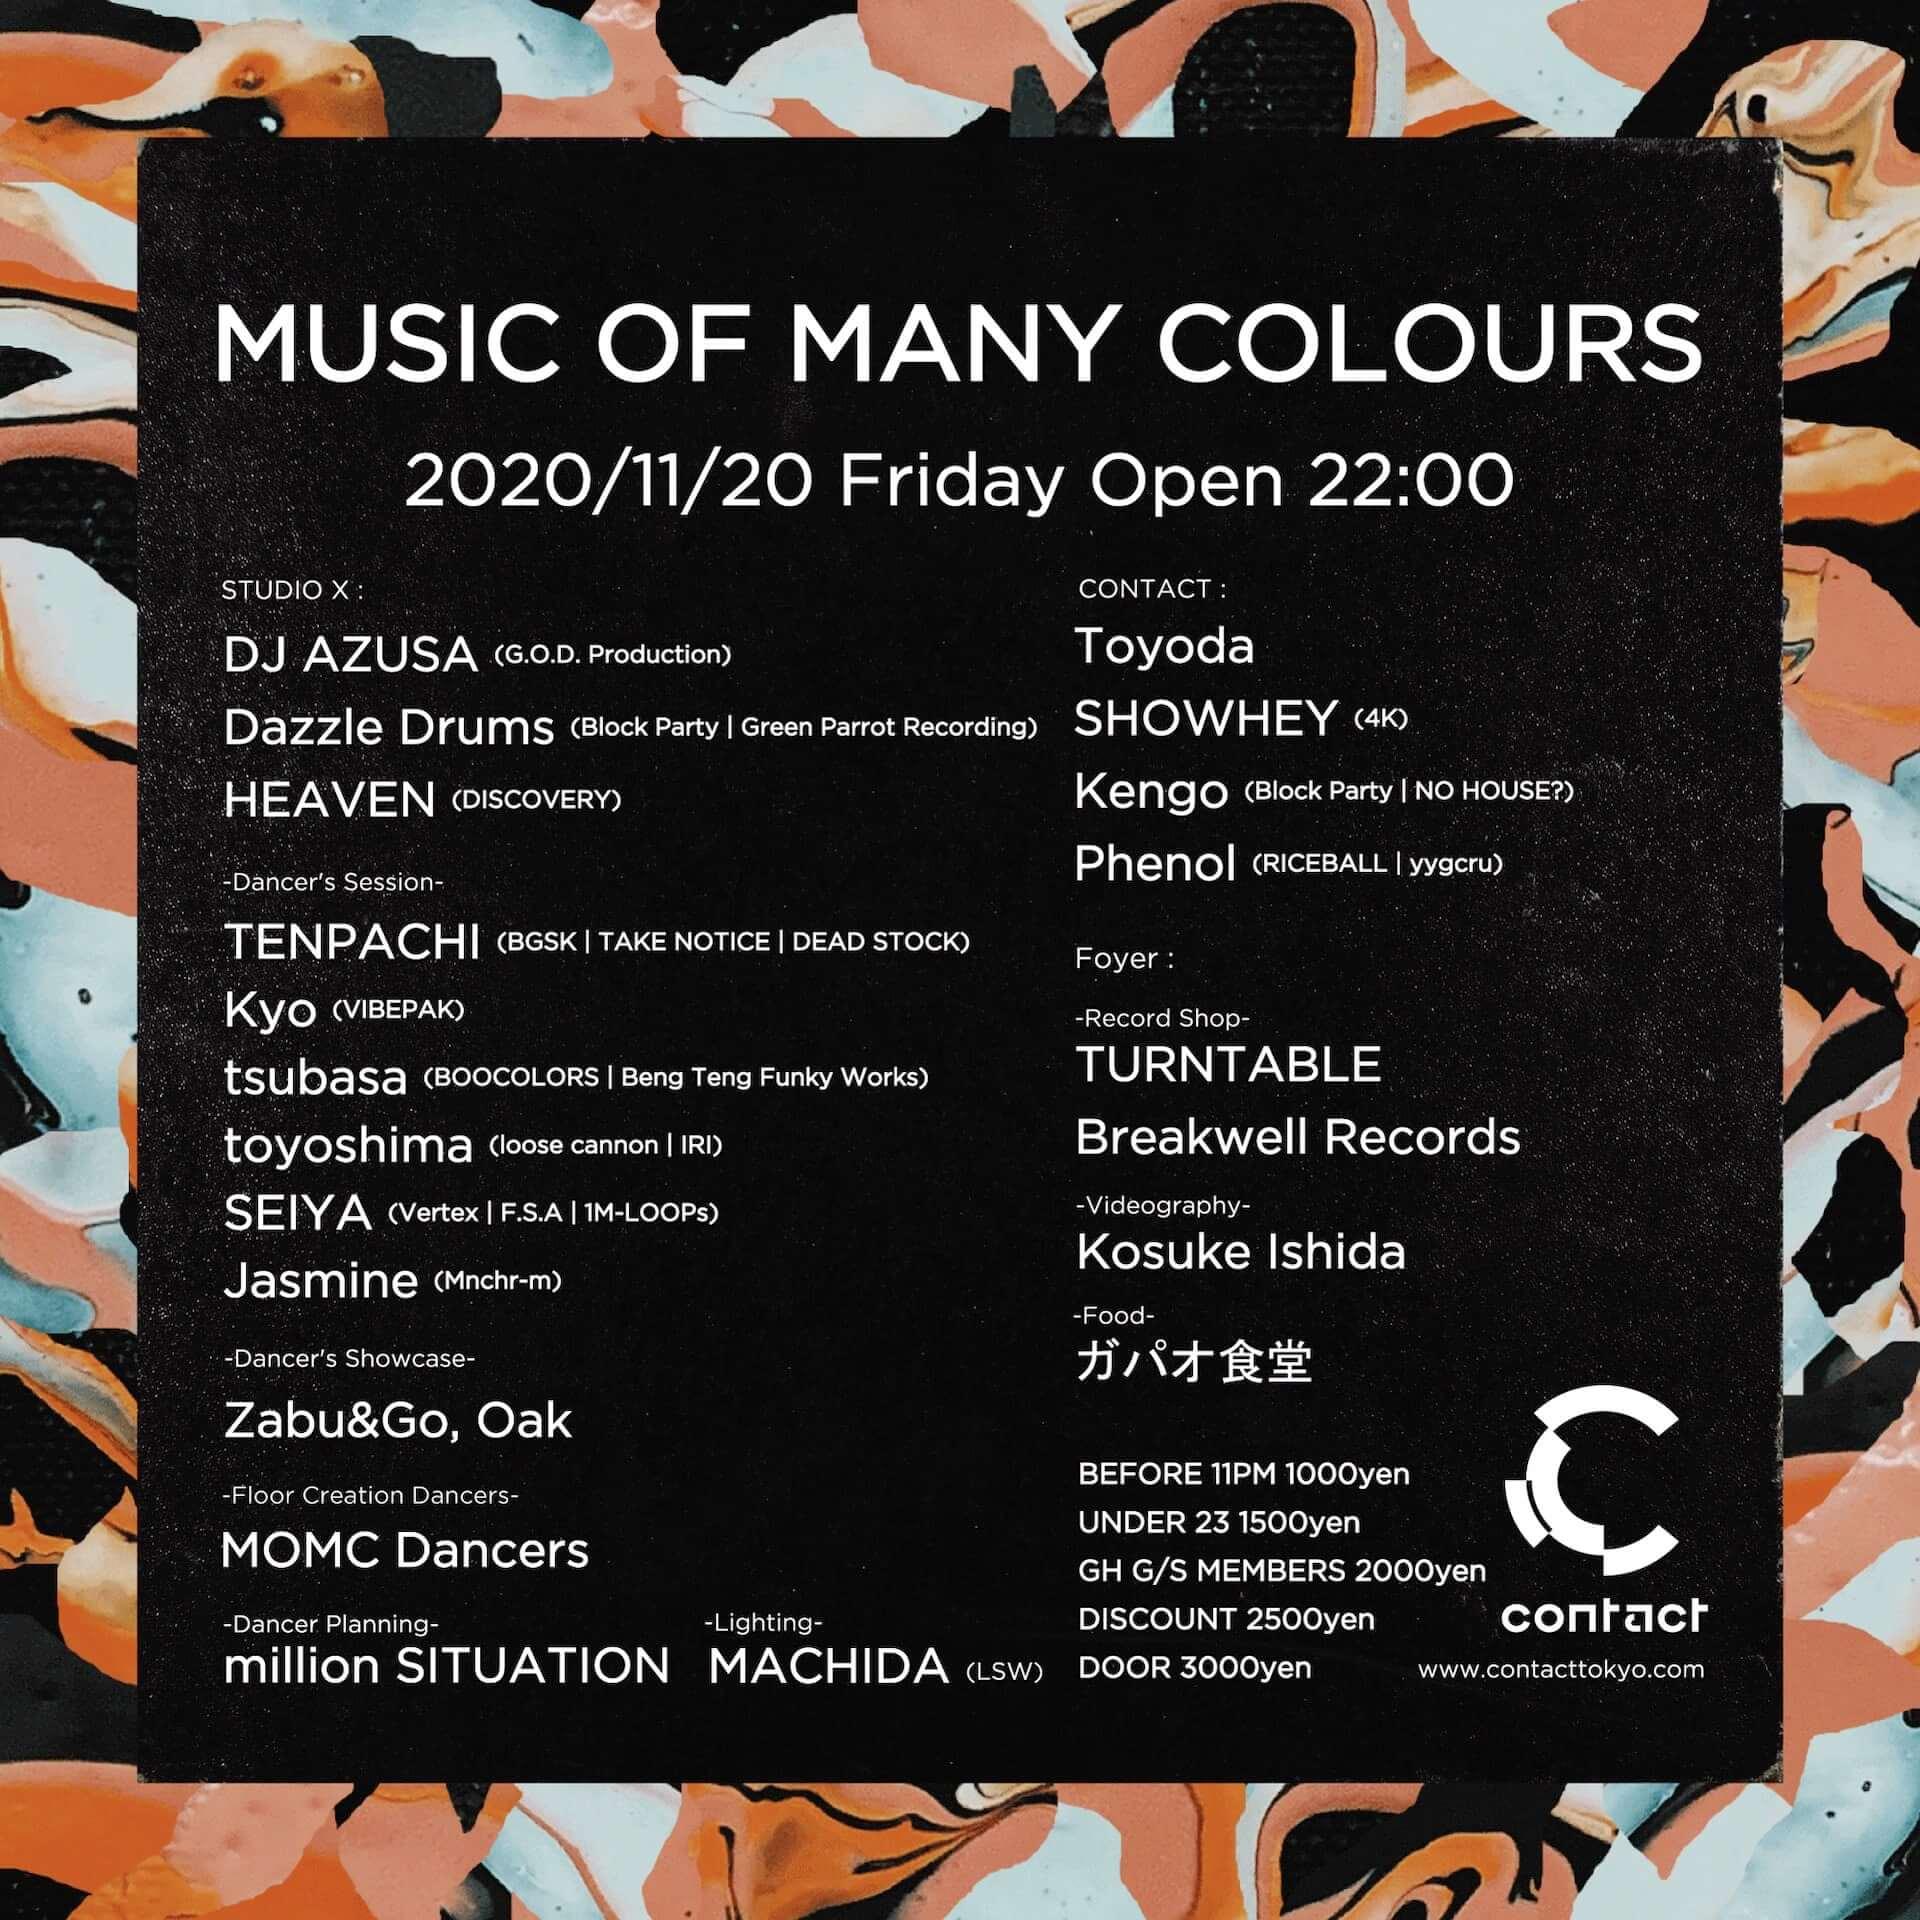 Dazzle Drums主催ハウスパーティー<Music Of Many Colours>が渋谷Contactで開催決定!DJ Azusa、TOYODAらが登場 music201112_contact_3-1920x1920